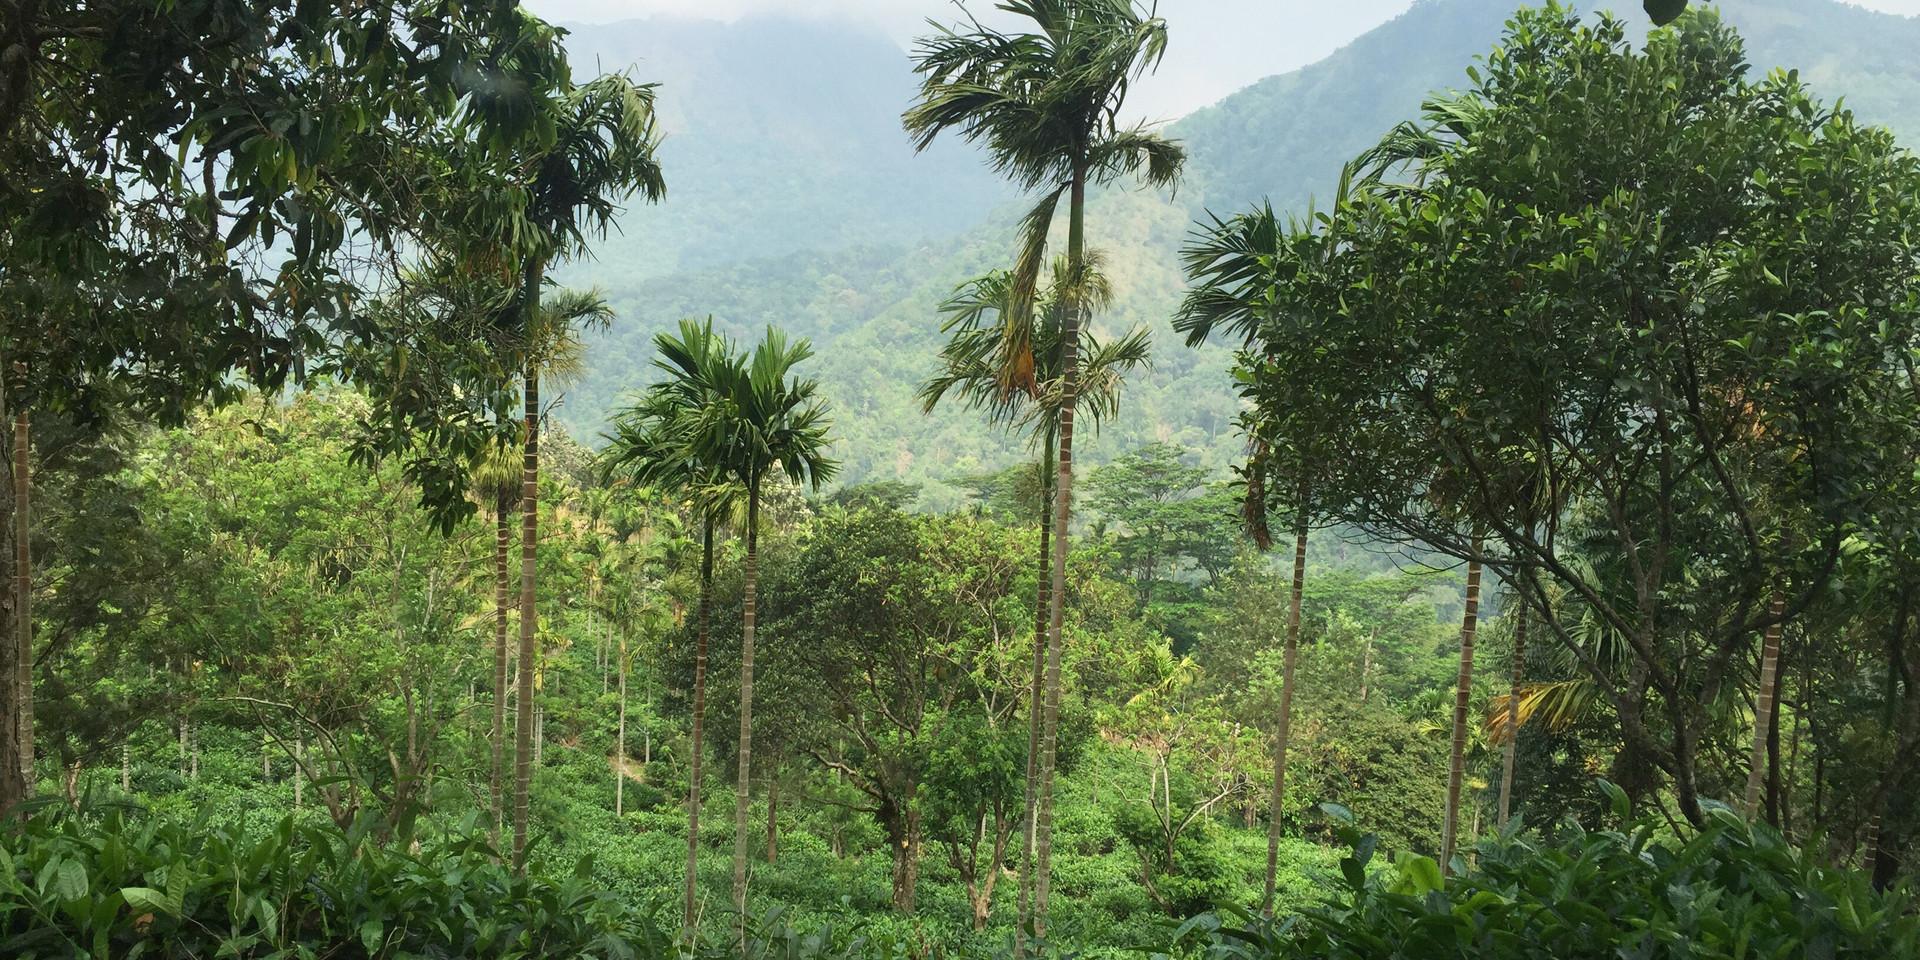 Tea leaves and coconut trees